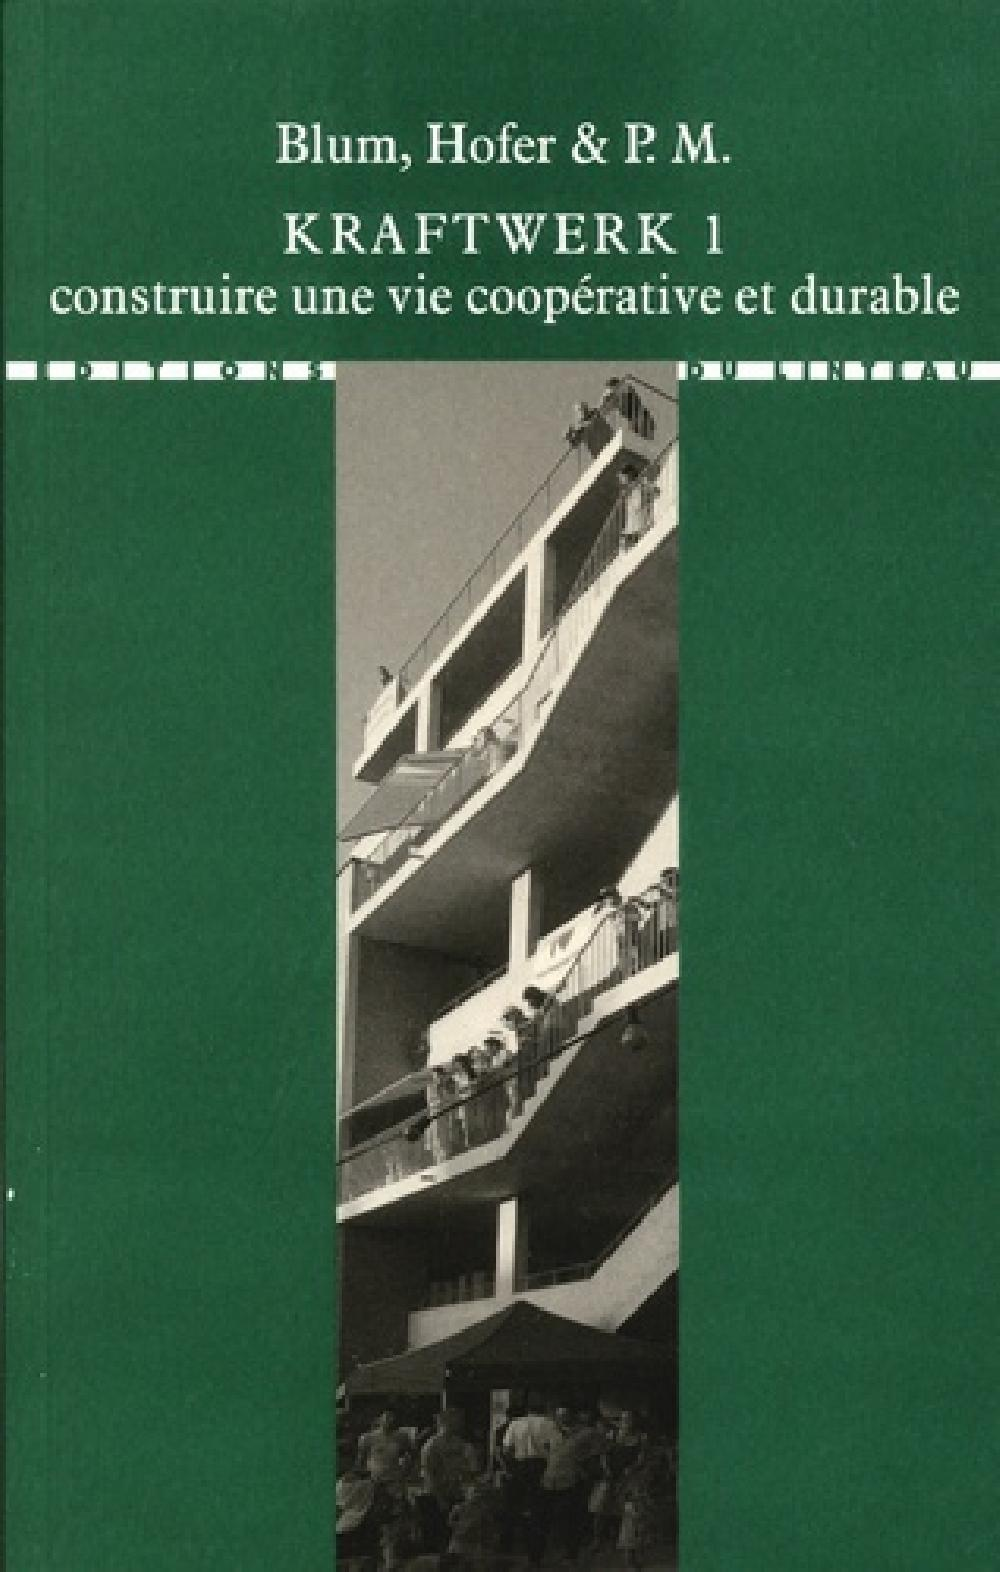 Kraftwerk 1 - Construire une vie coopérative et durable